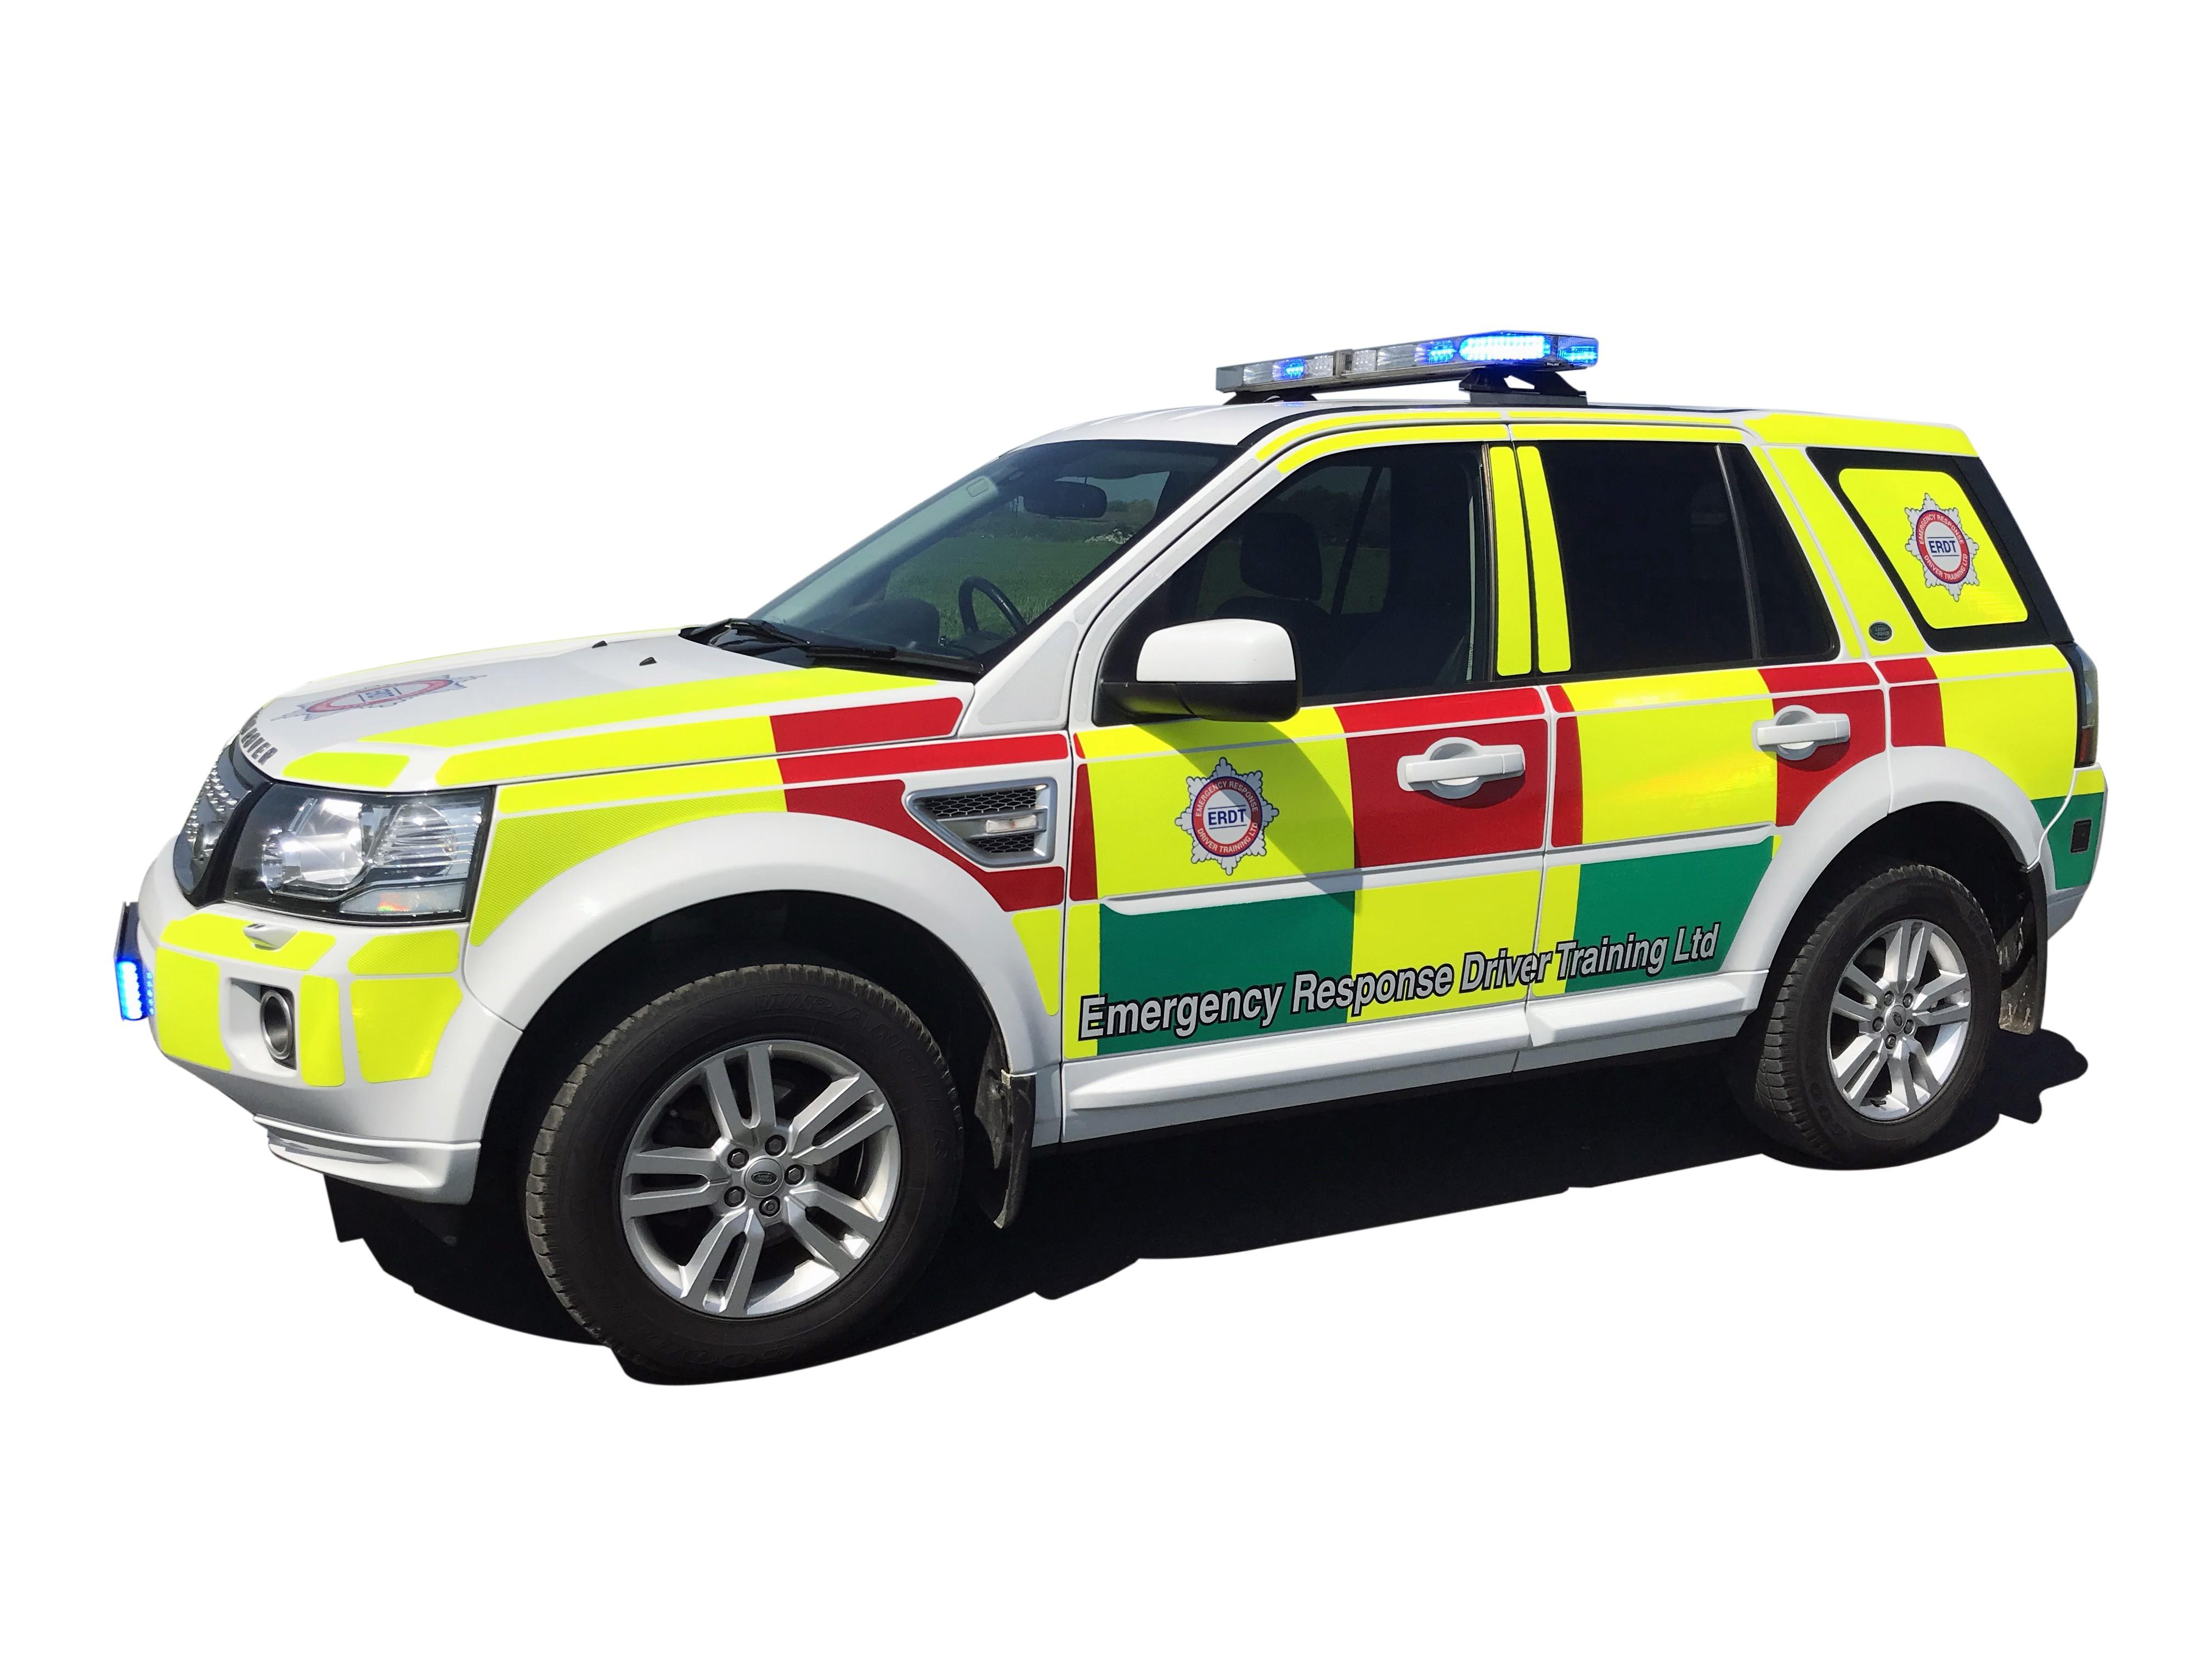 03ba8b5dc51 Emergency Response Driver Training Ltd (ERDT) cover image